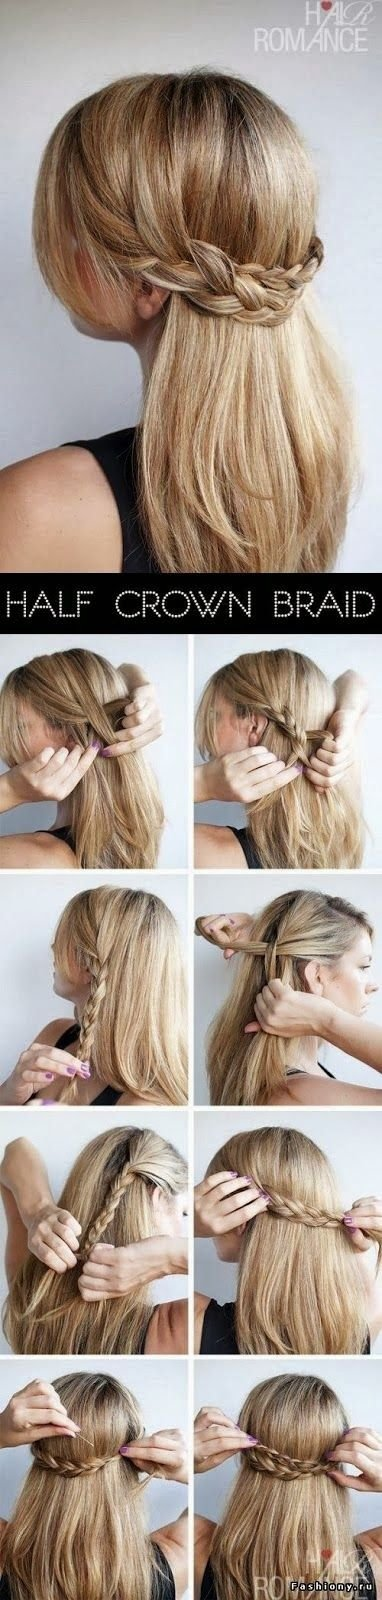 hair,hairstyle,brown,fur,fur clothing,